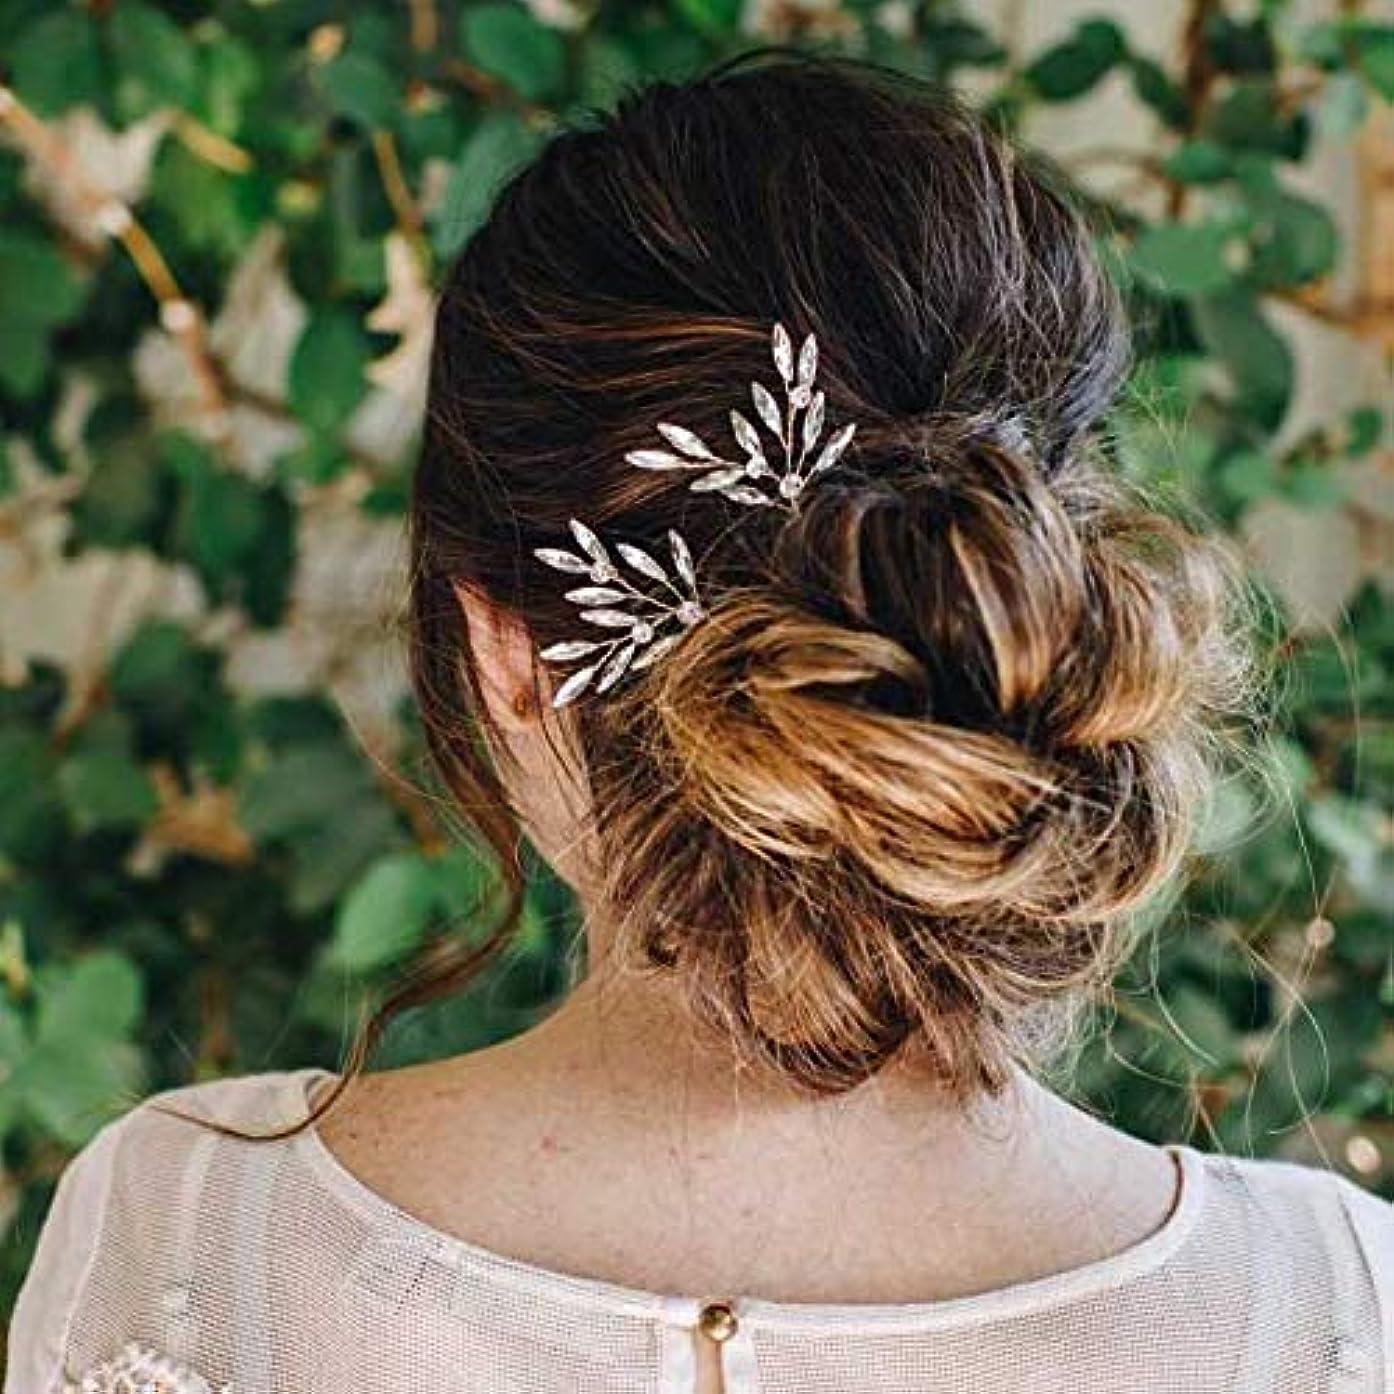 Olbye Wedding Hair Pins Silver Crystal Bridal Hair Accessories for Bride and Bridesmaids Decorative Hair Pins 2PCS (Silver)